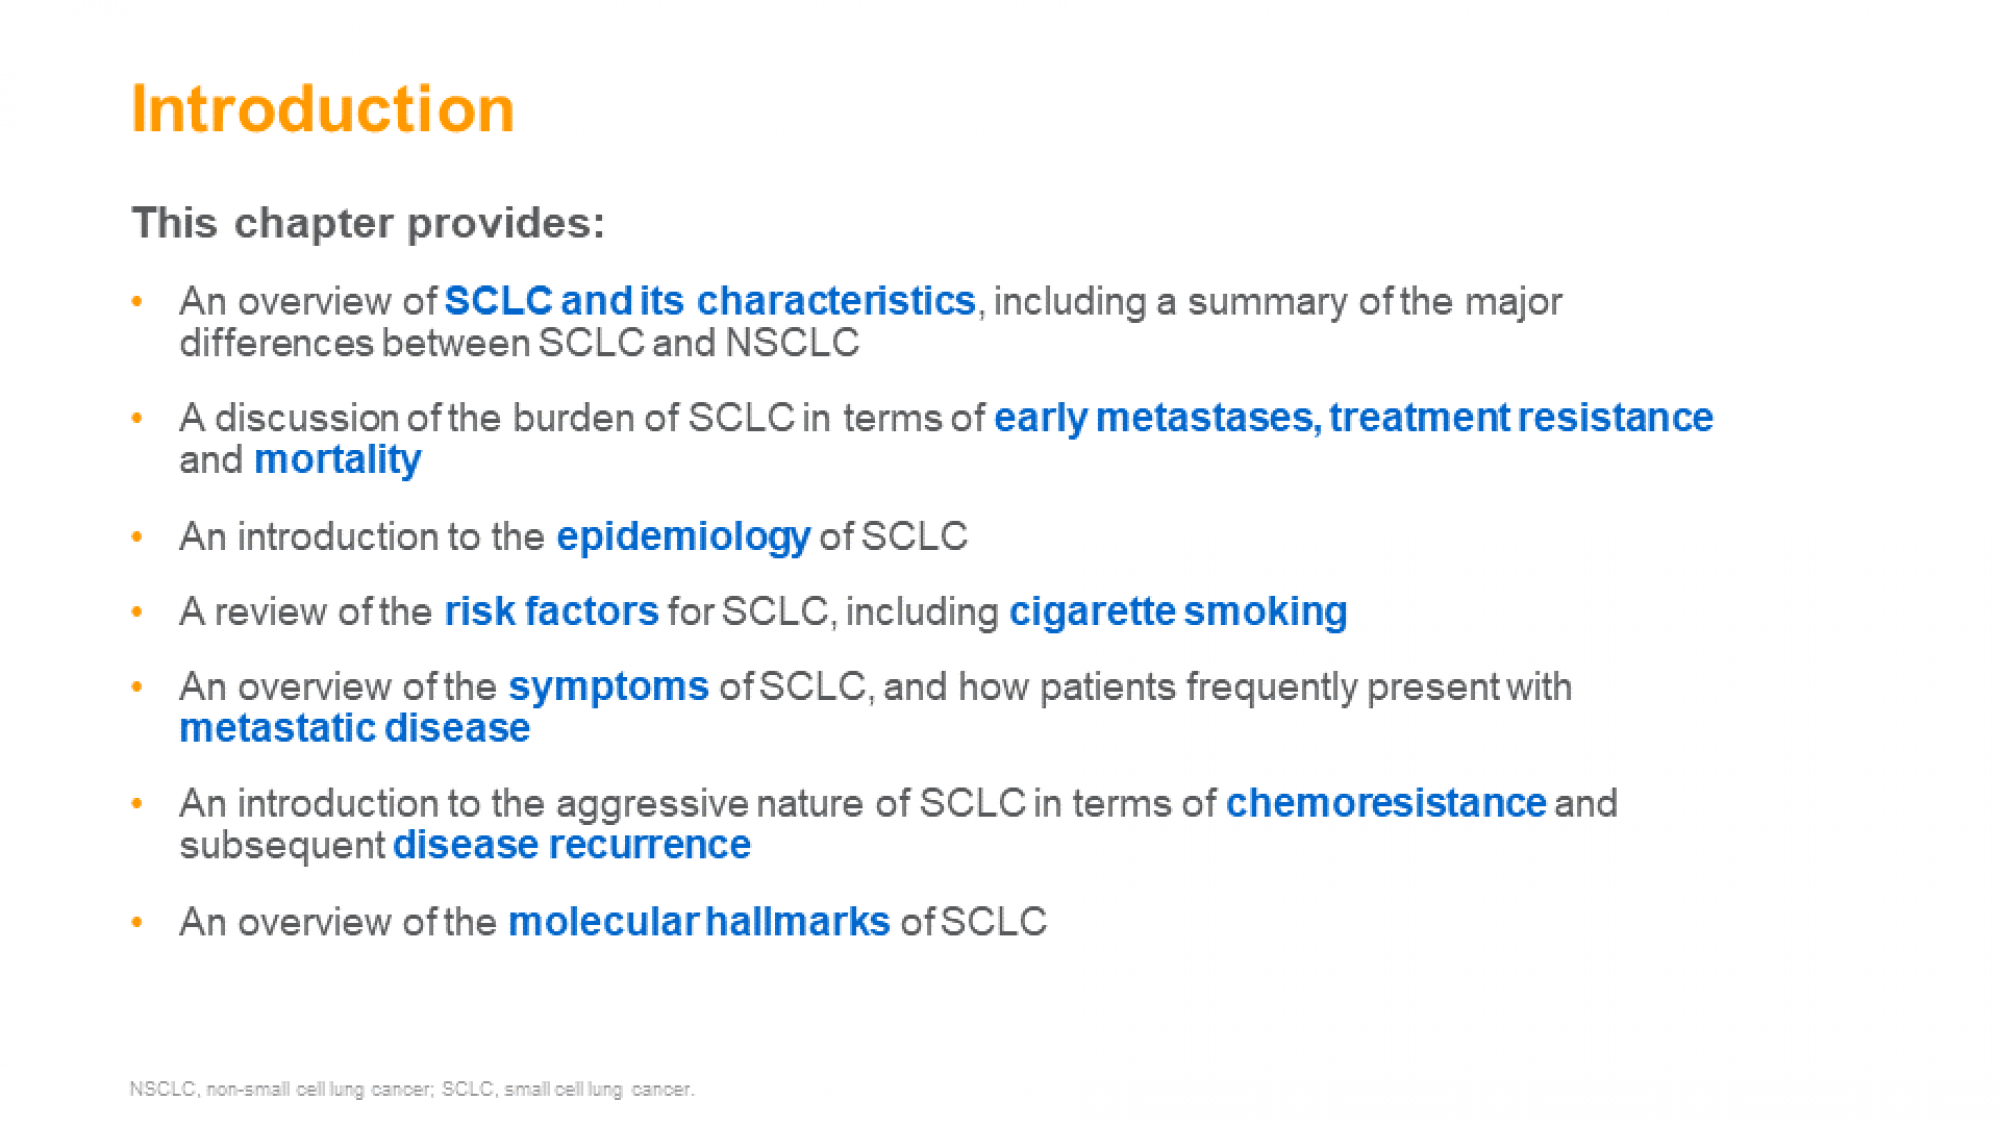 SCLC slide 2